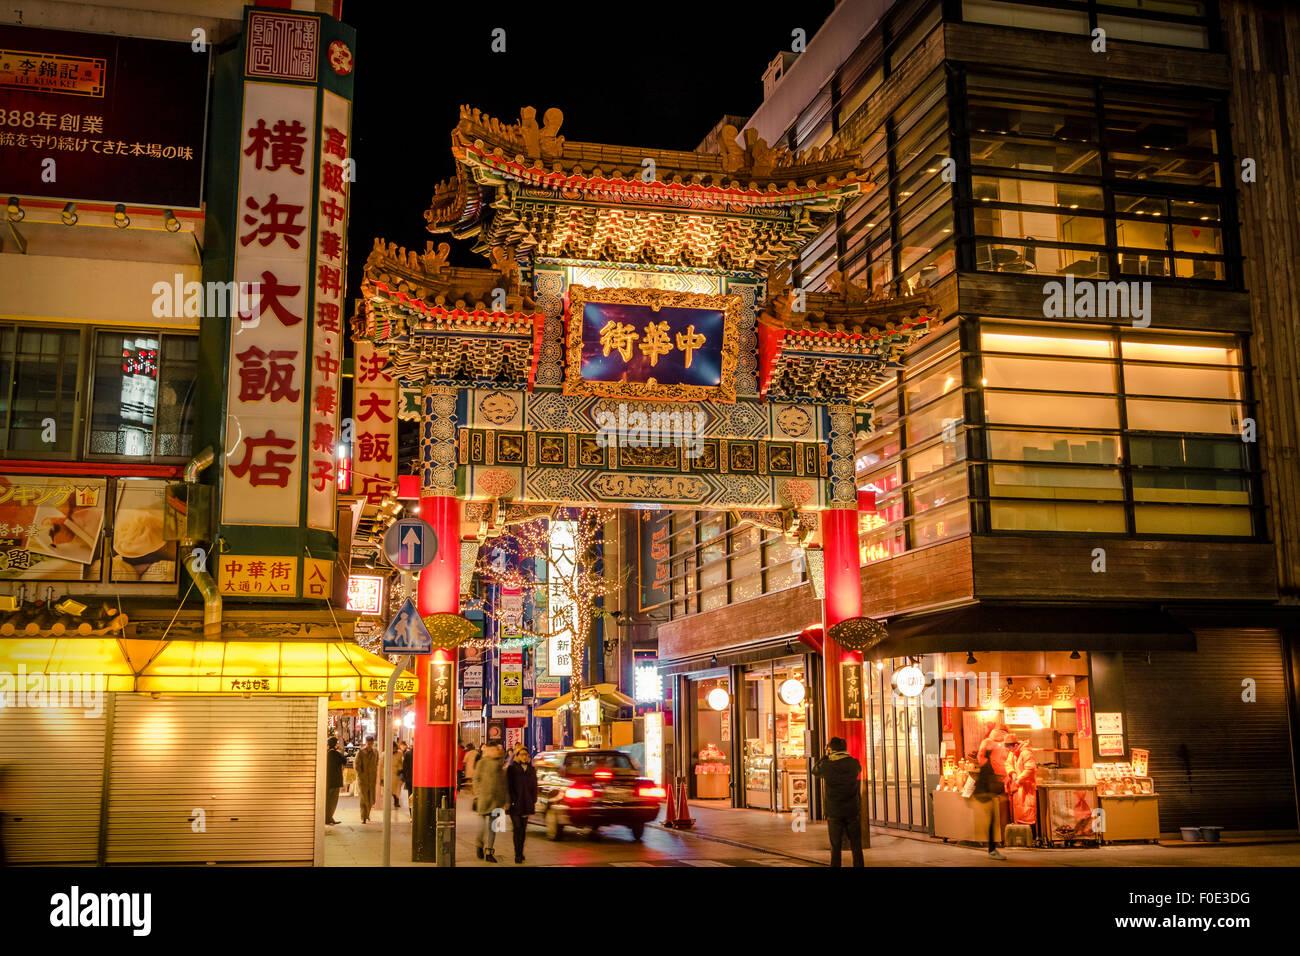 China Town in Yokohama, Japan - Stock Image